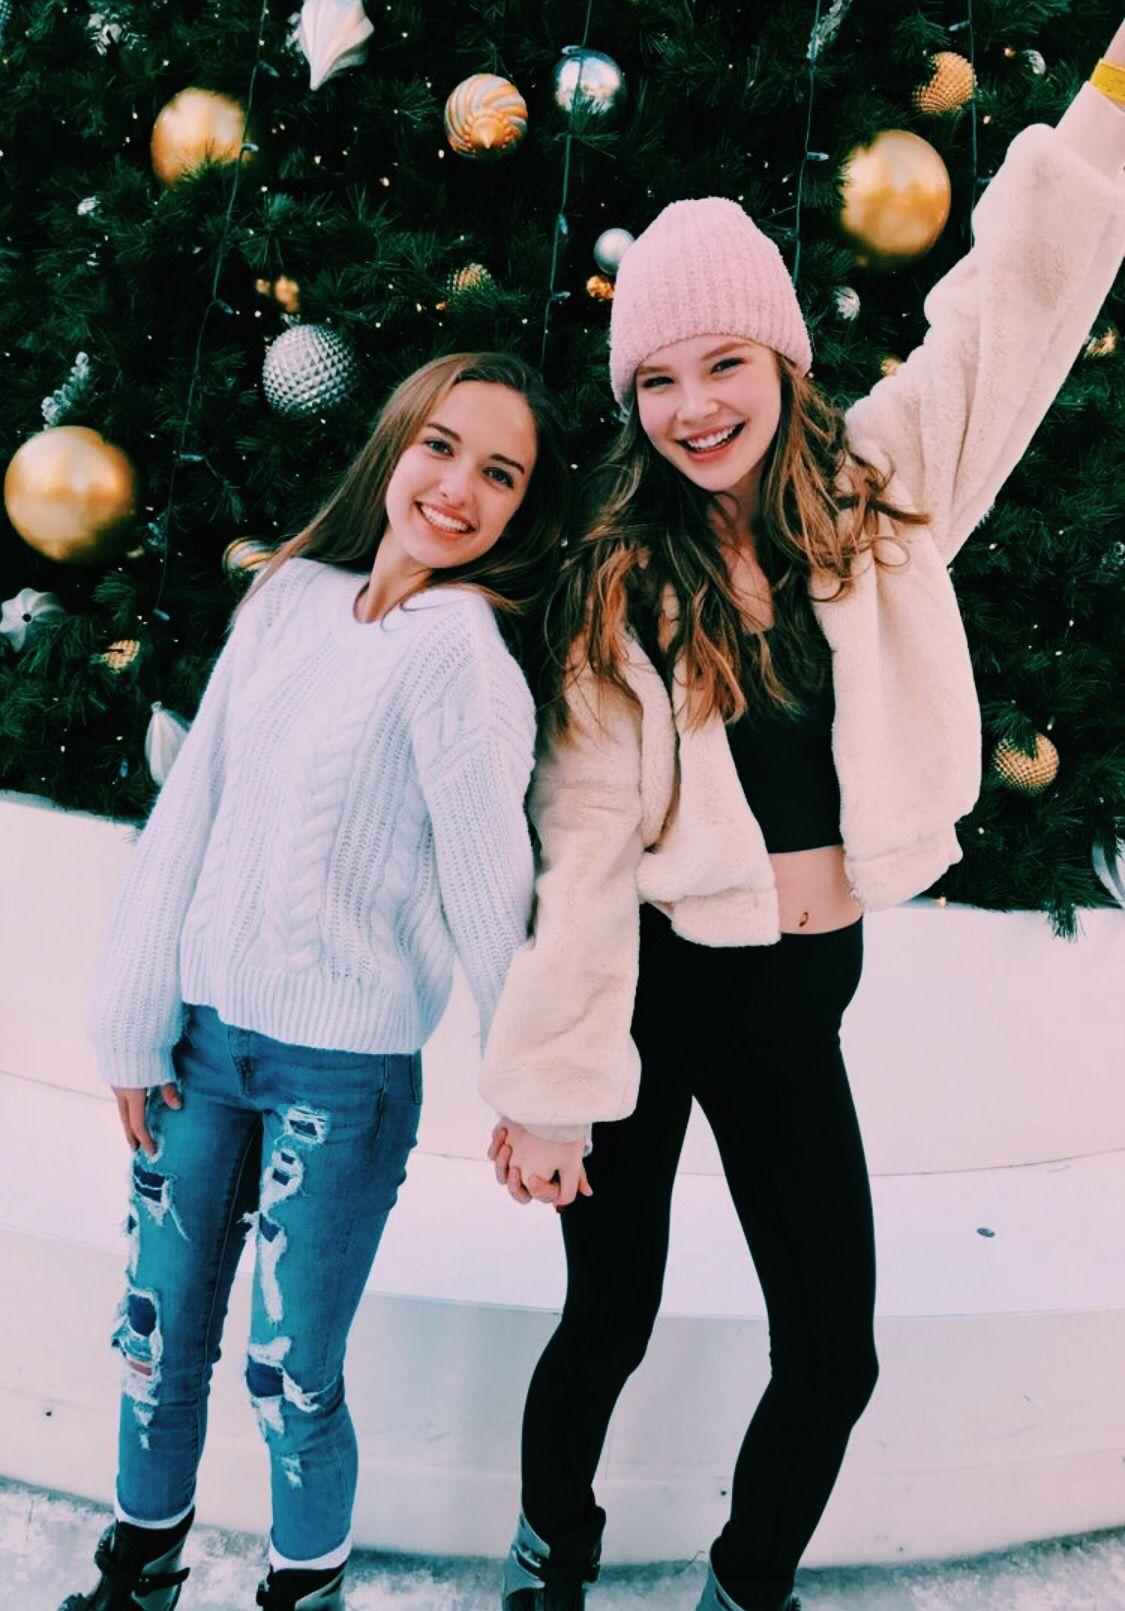 Pinterest Carolinefaith417 Winter Photoshoot Christmas Photoshoot Friend Photoshoot